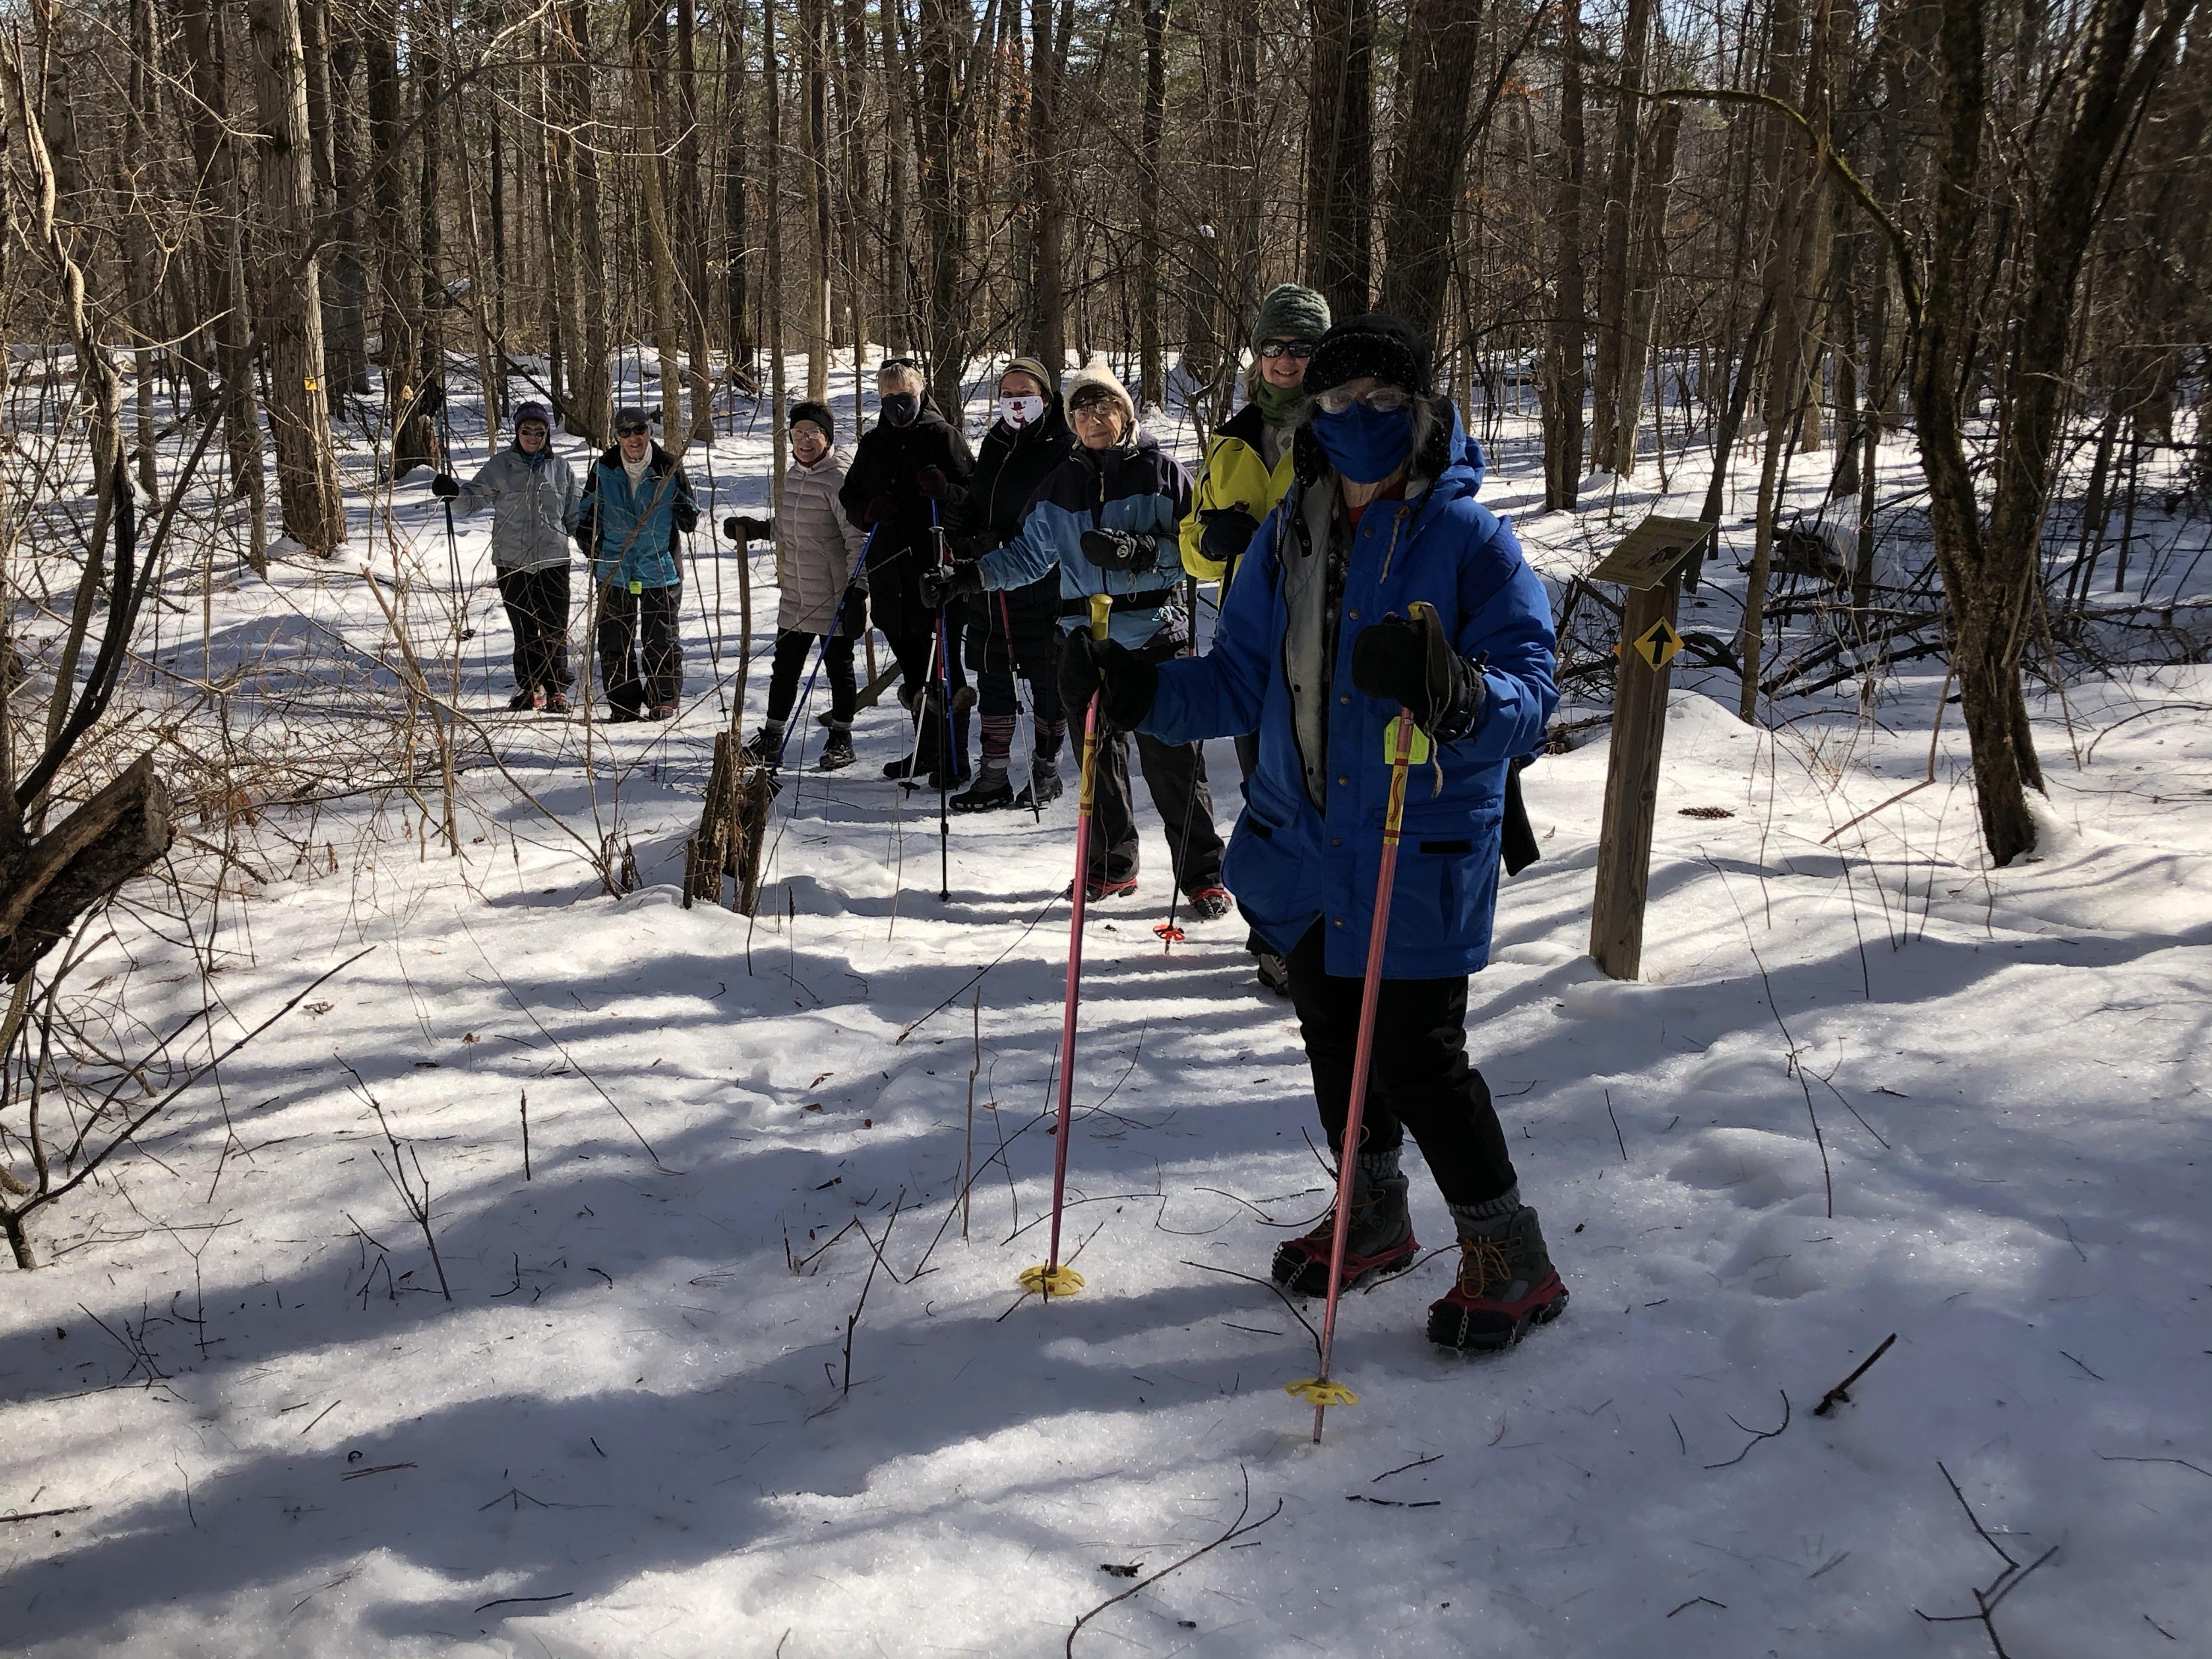 Garnsey-Nancys-Group-in-Woods